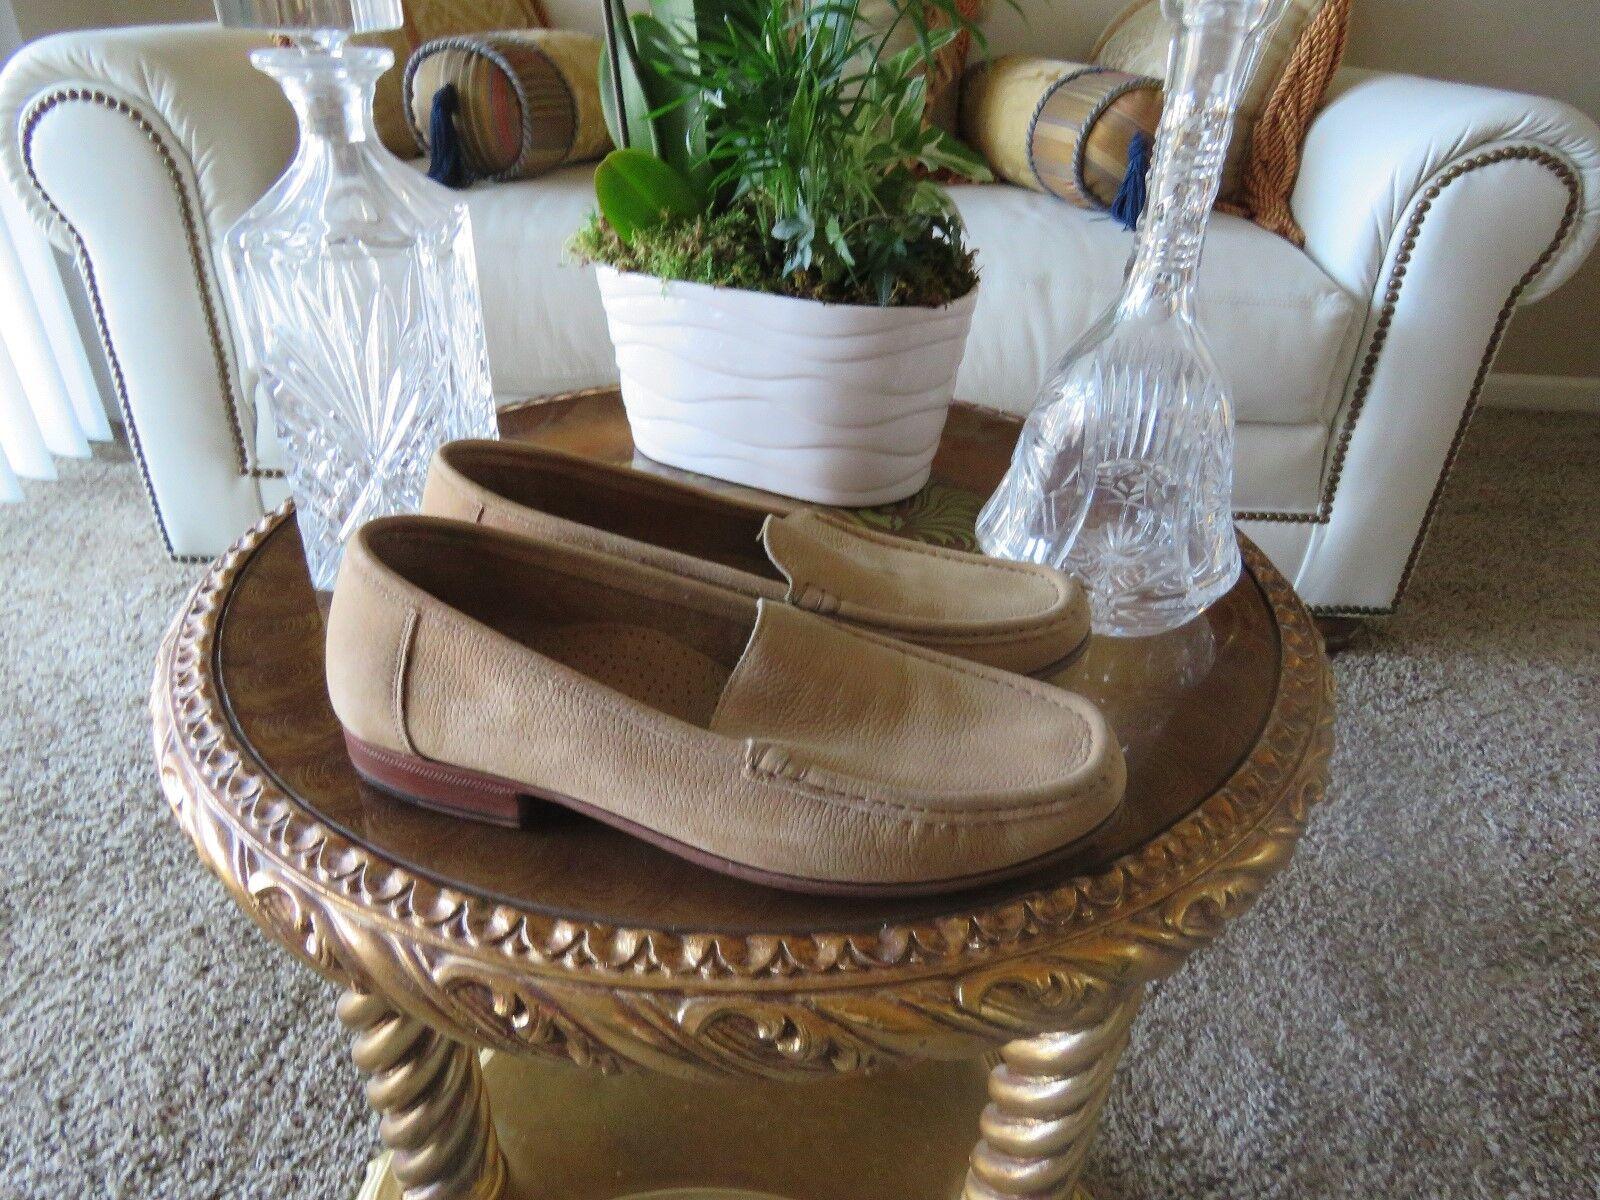 shoes Giorgo size 12 Brutini nogvfa4509 Men's Formal Shoes